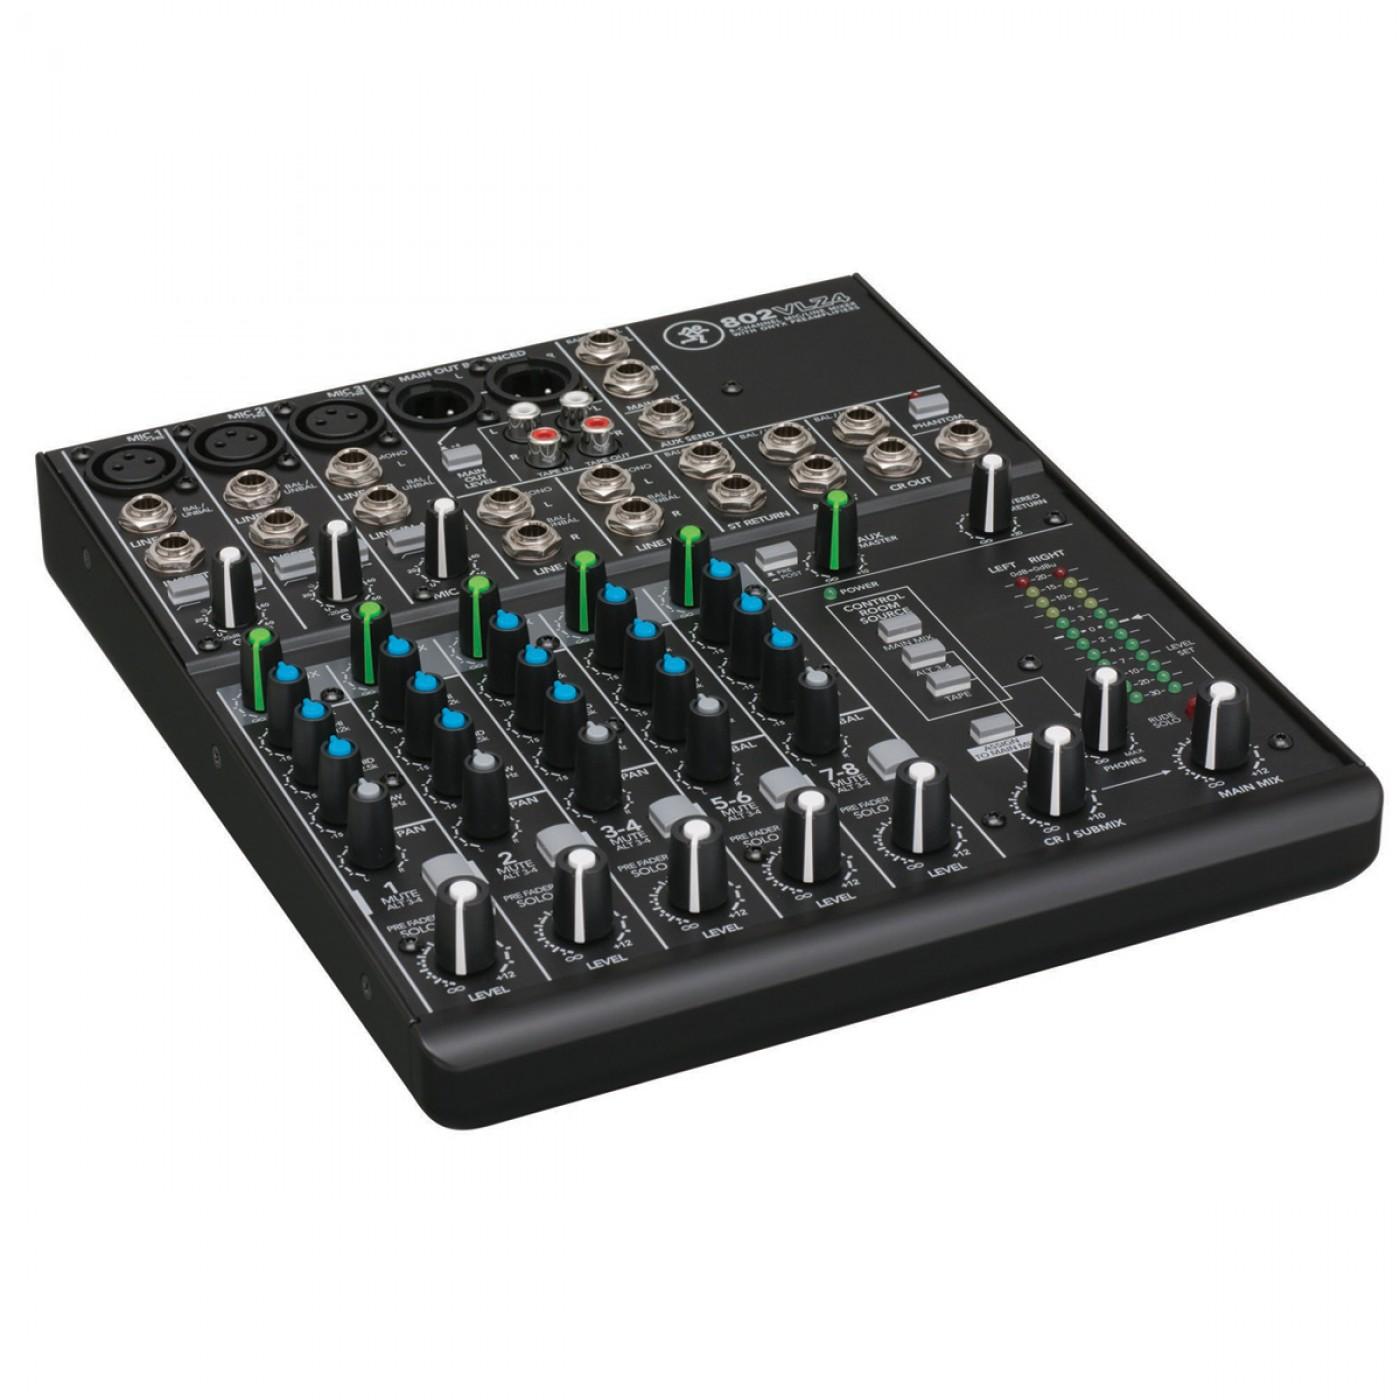 Mackie 802 VLZ4 | Rage Audio